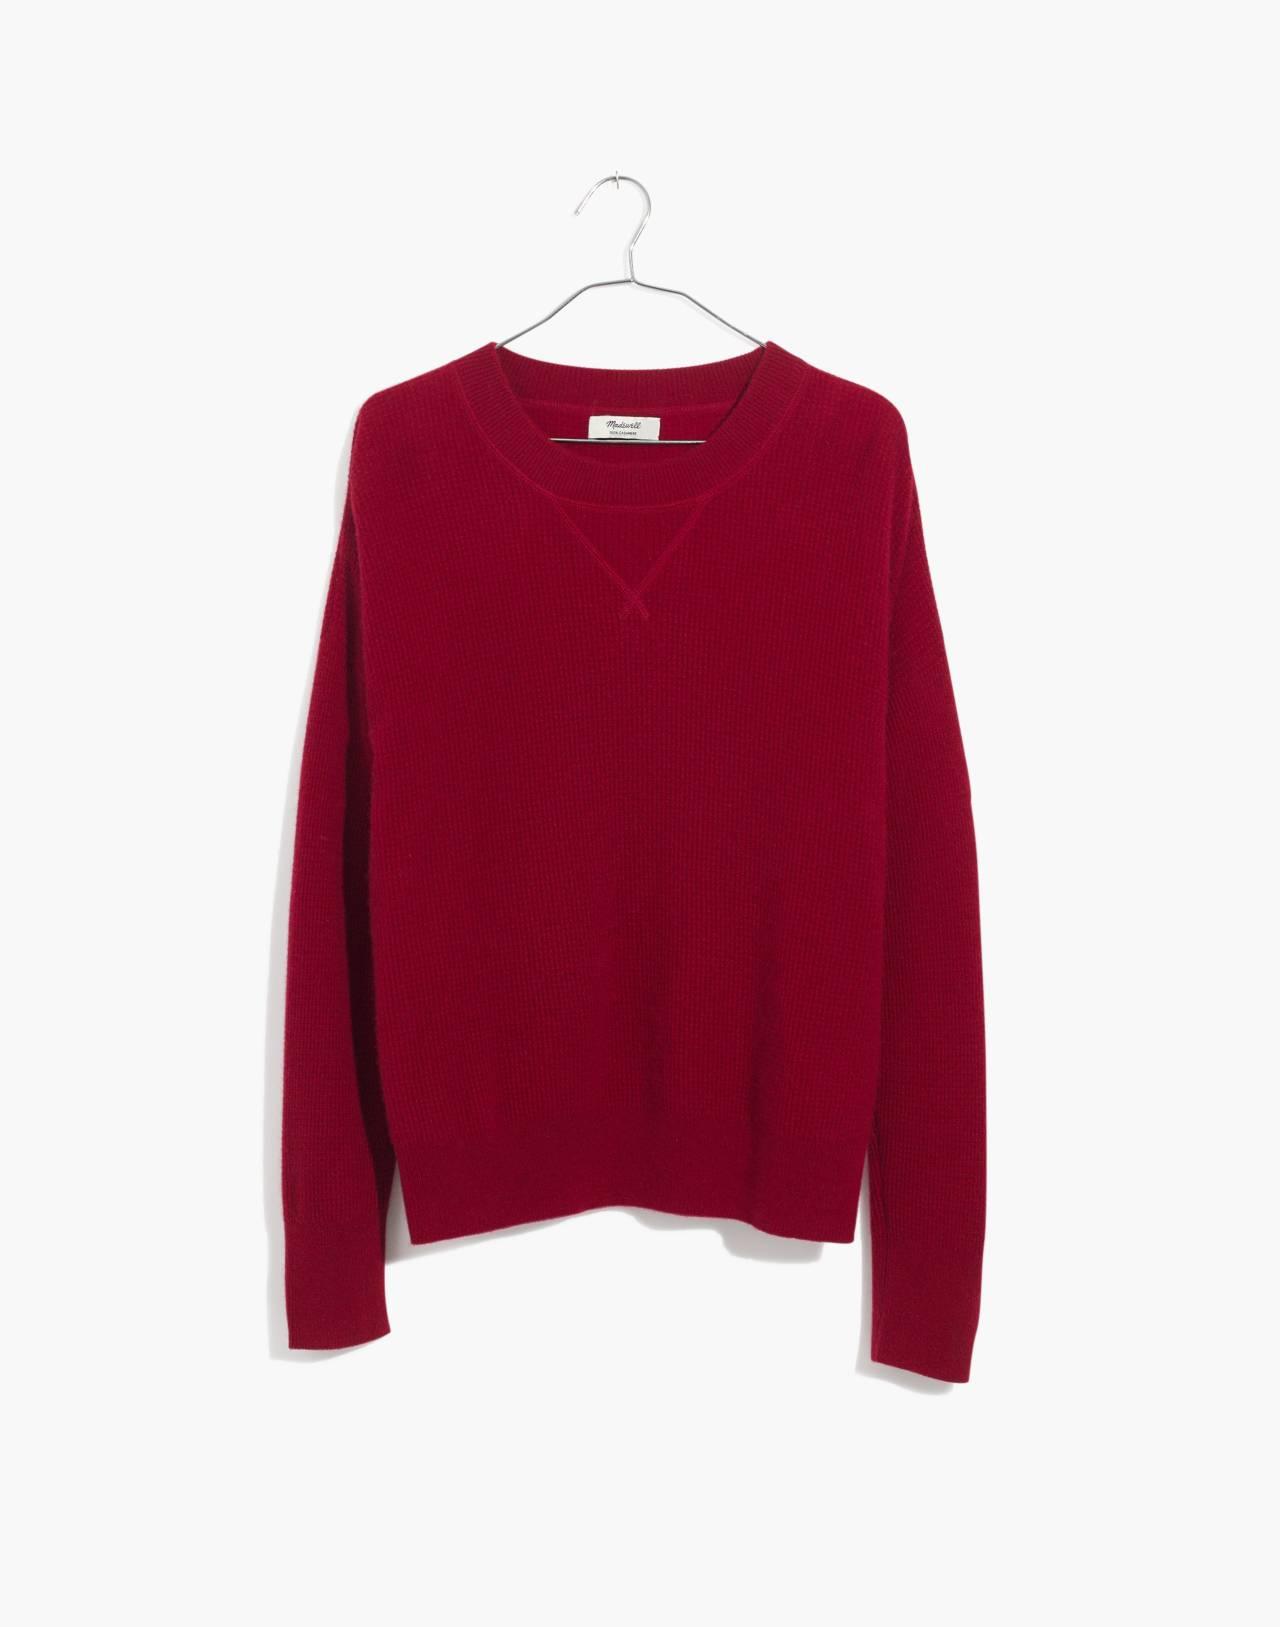 Cashmere Sweatshirt in crimson red image 4